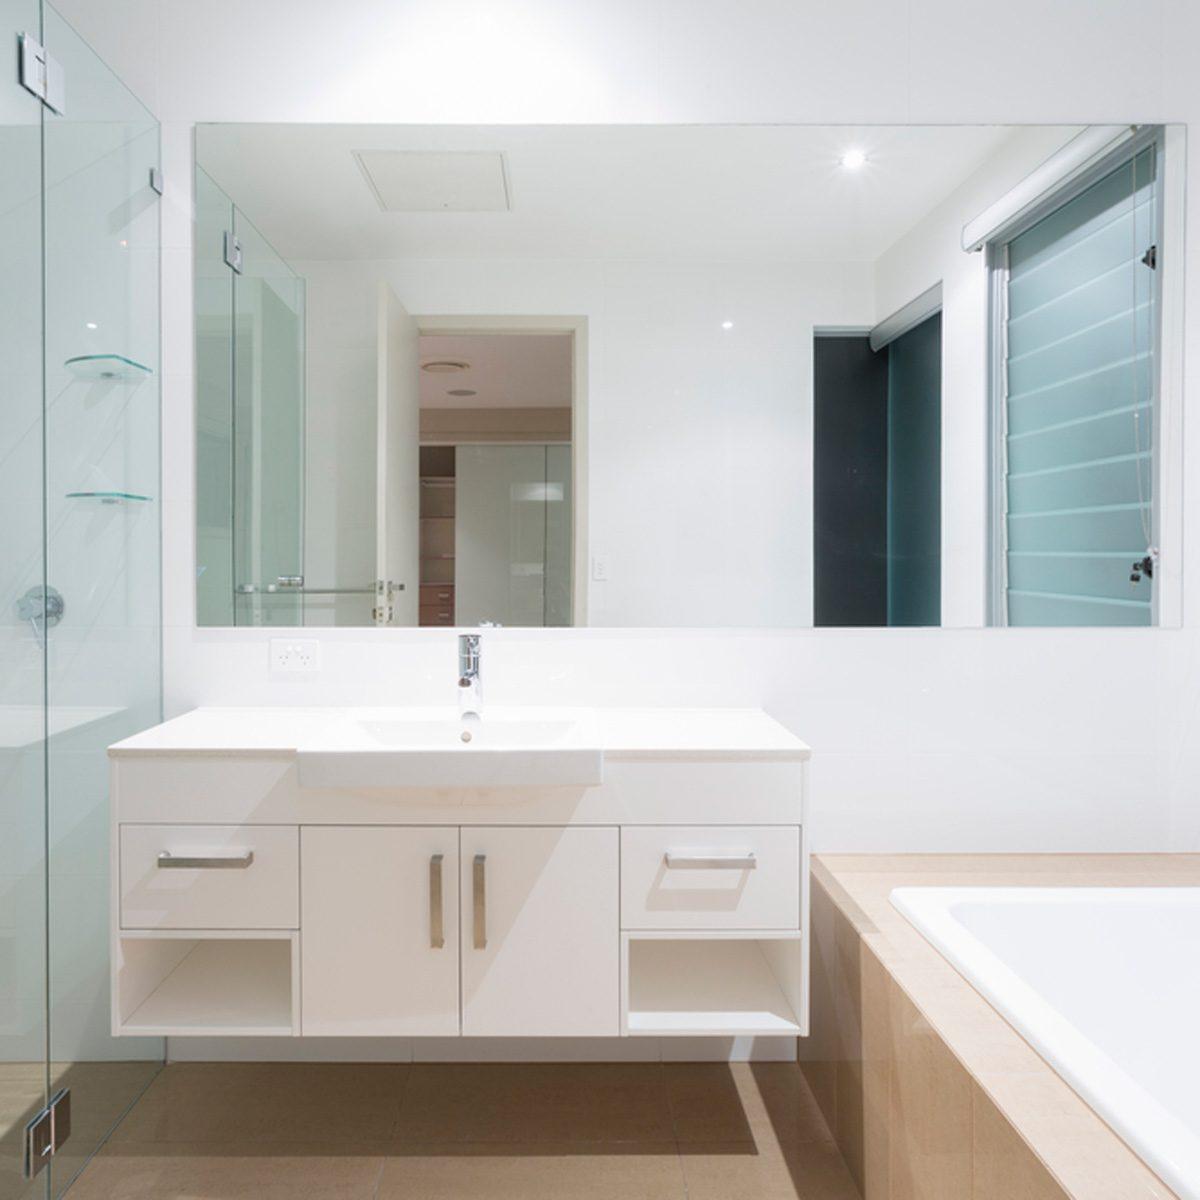 10 Genius Small Master Bathroom Ideas that WOW! | Family ...